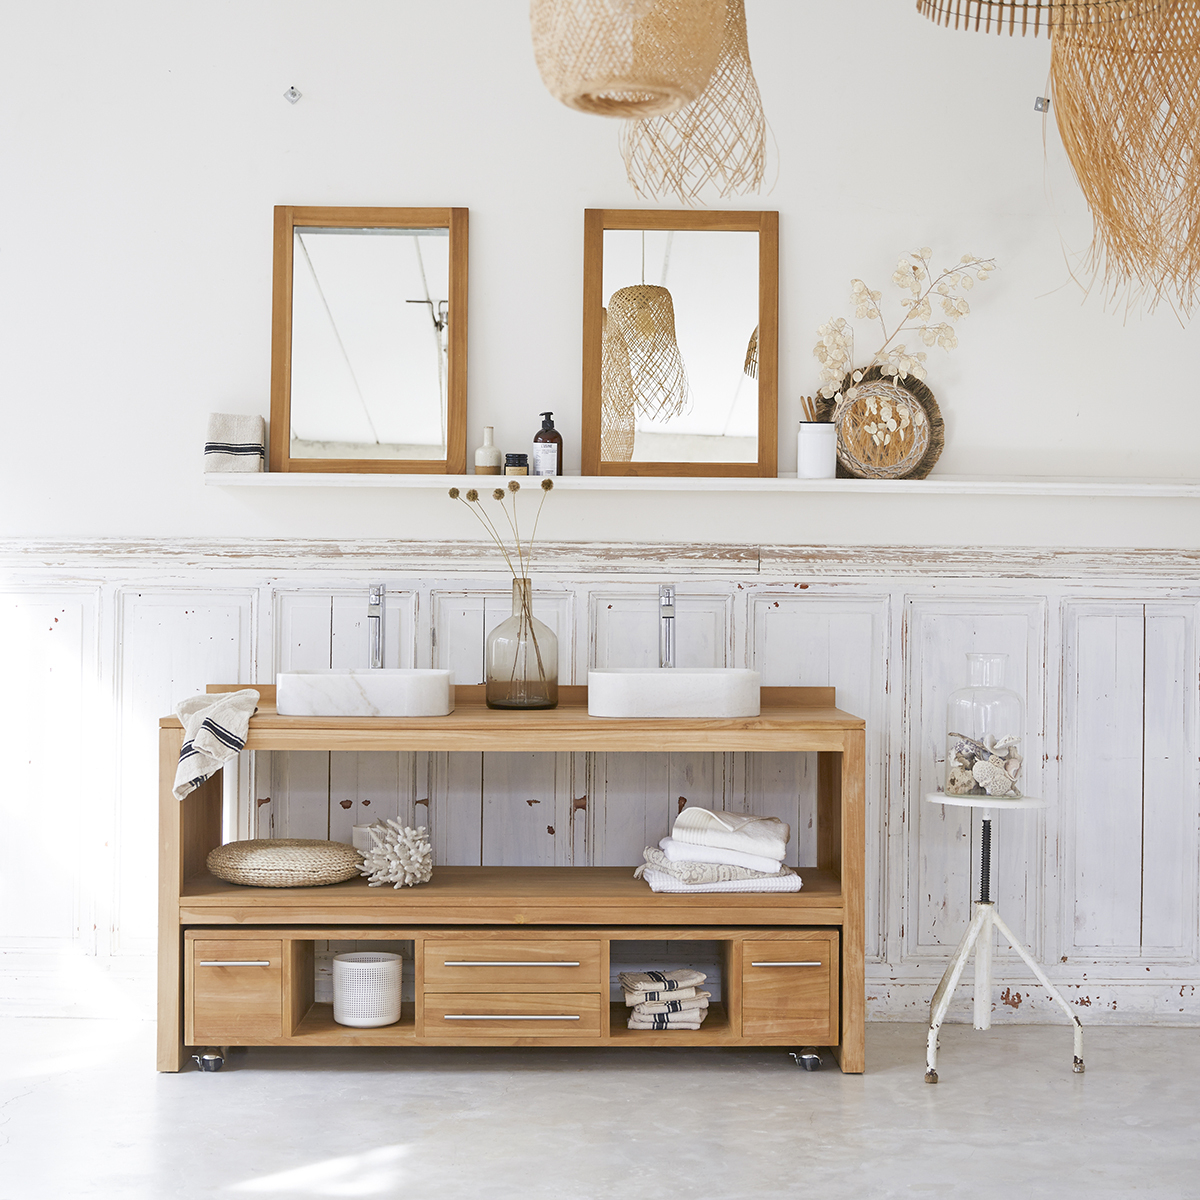 Natural Teak Bathroom Washstand - Layang Duo Furniture avec Tikamoon